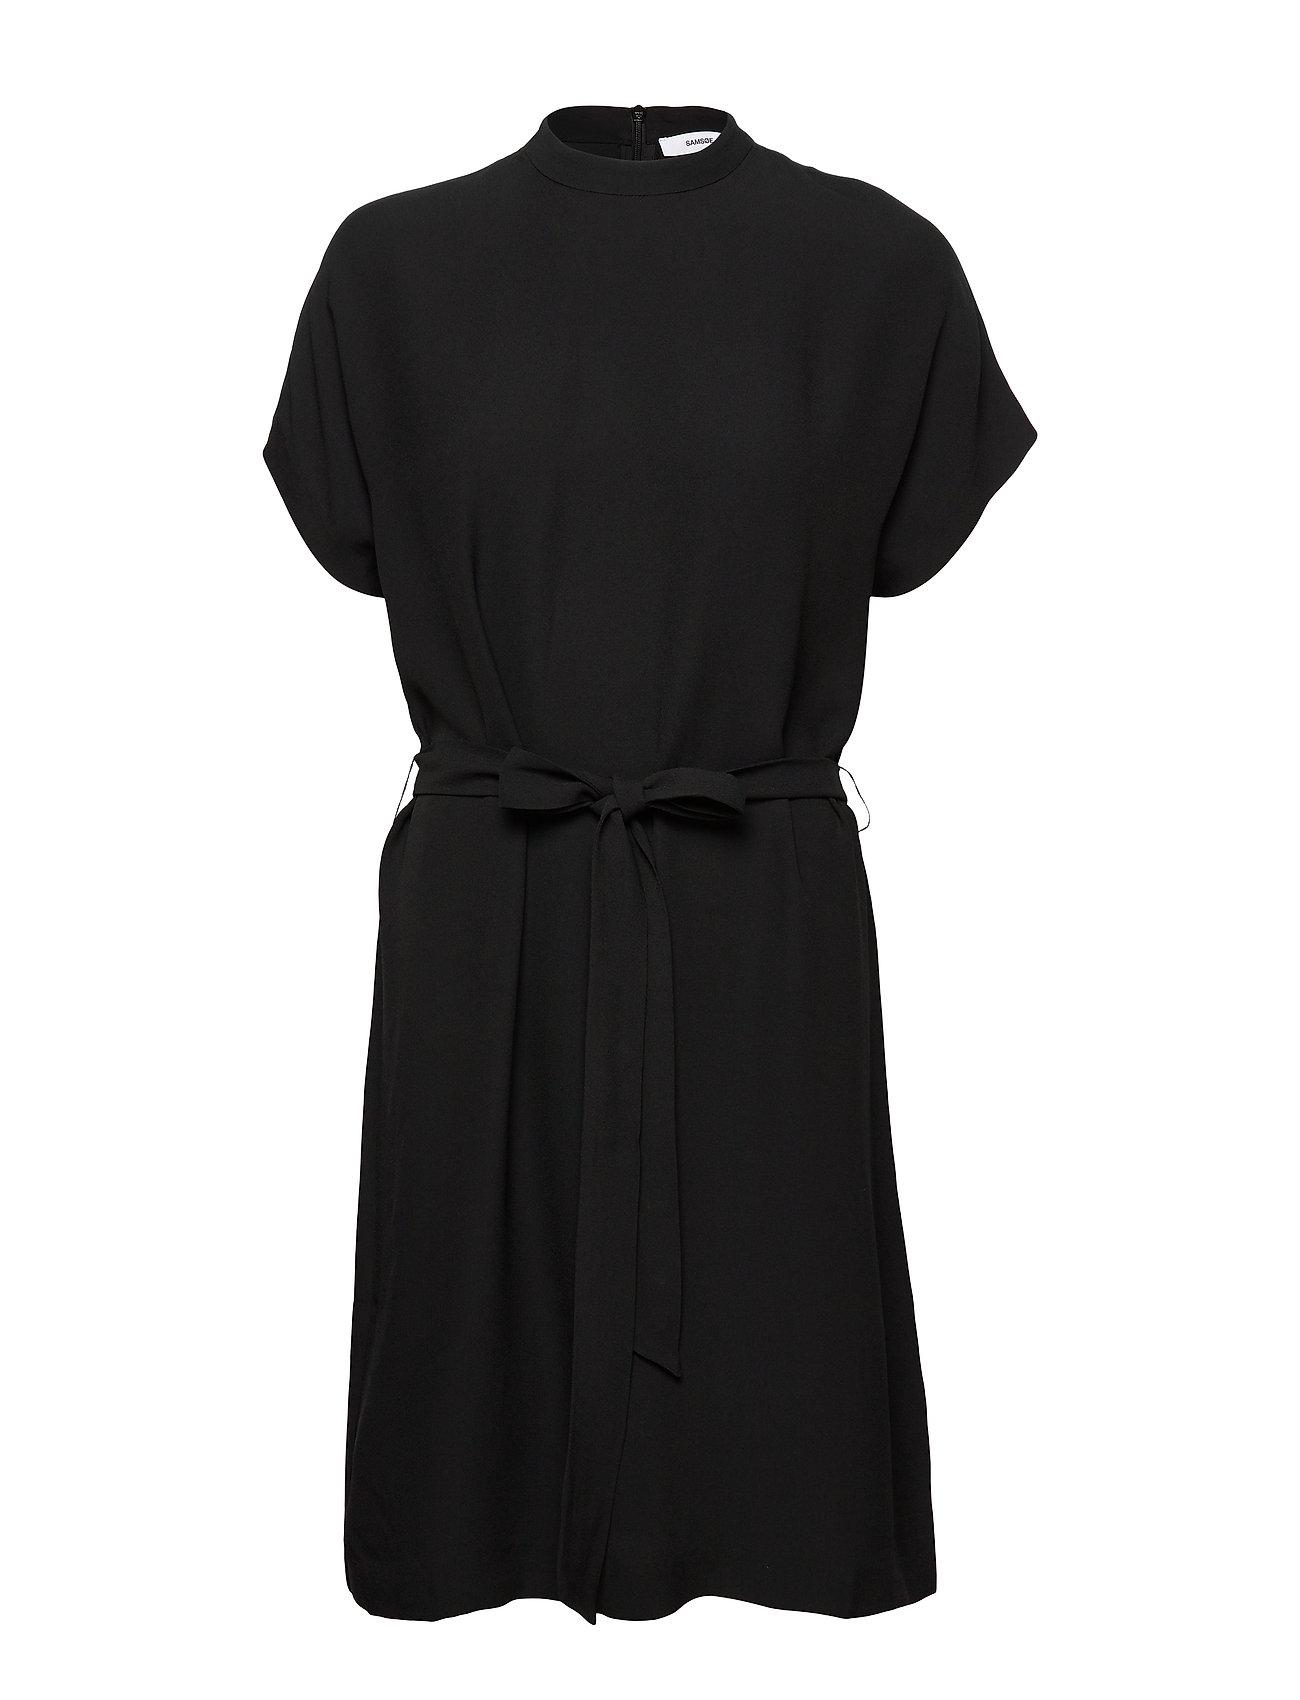 Samsøe & Samsøe Kimberly ss dress 8325 - BLACK